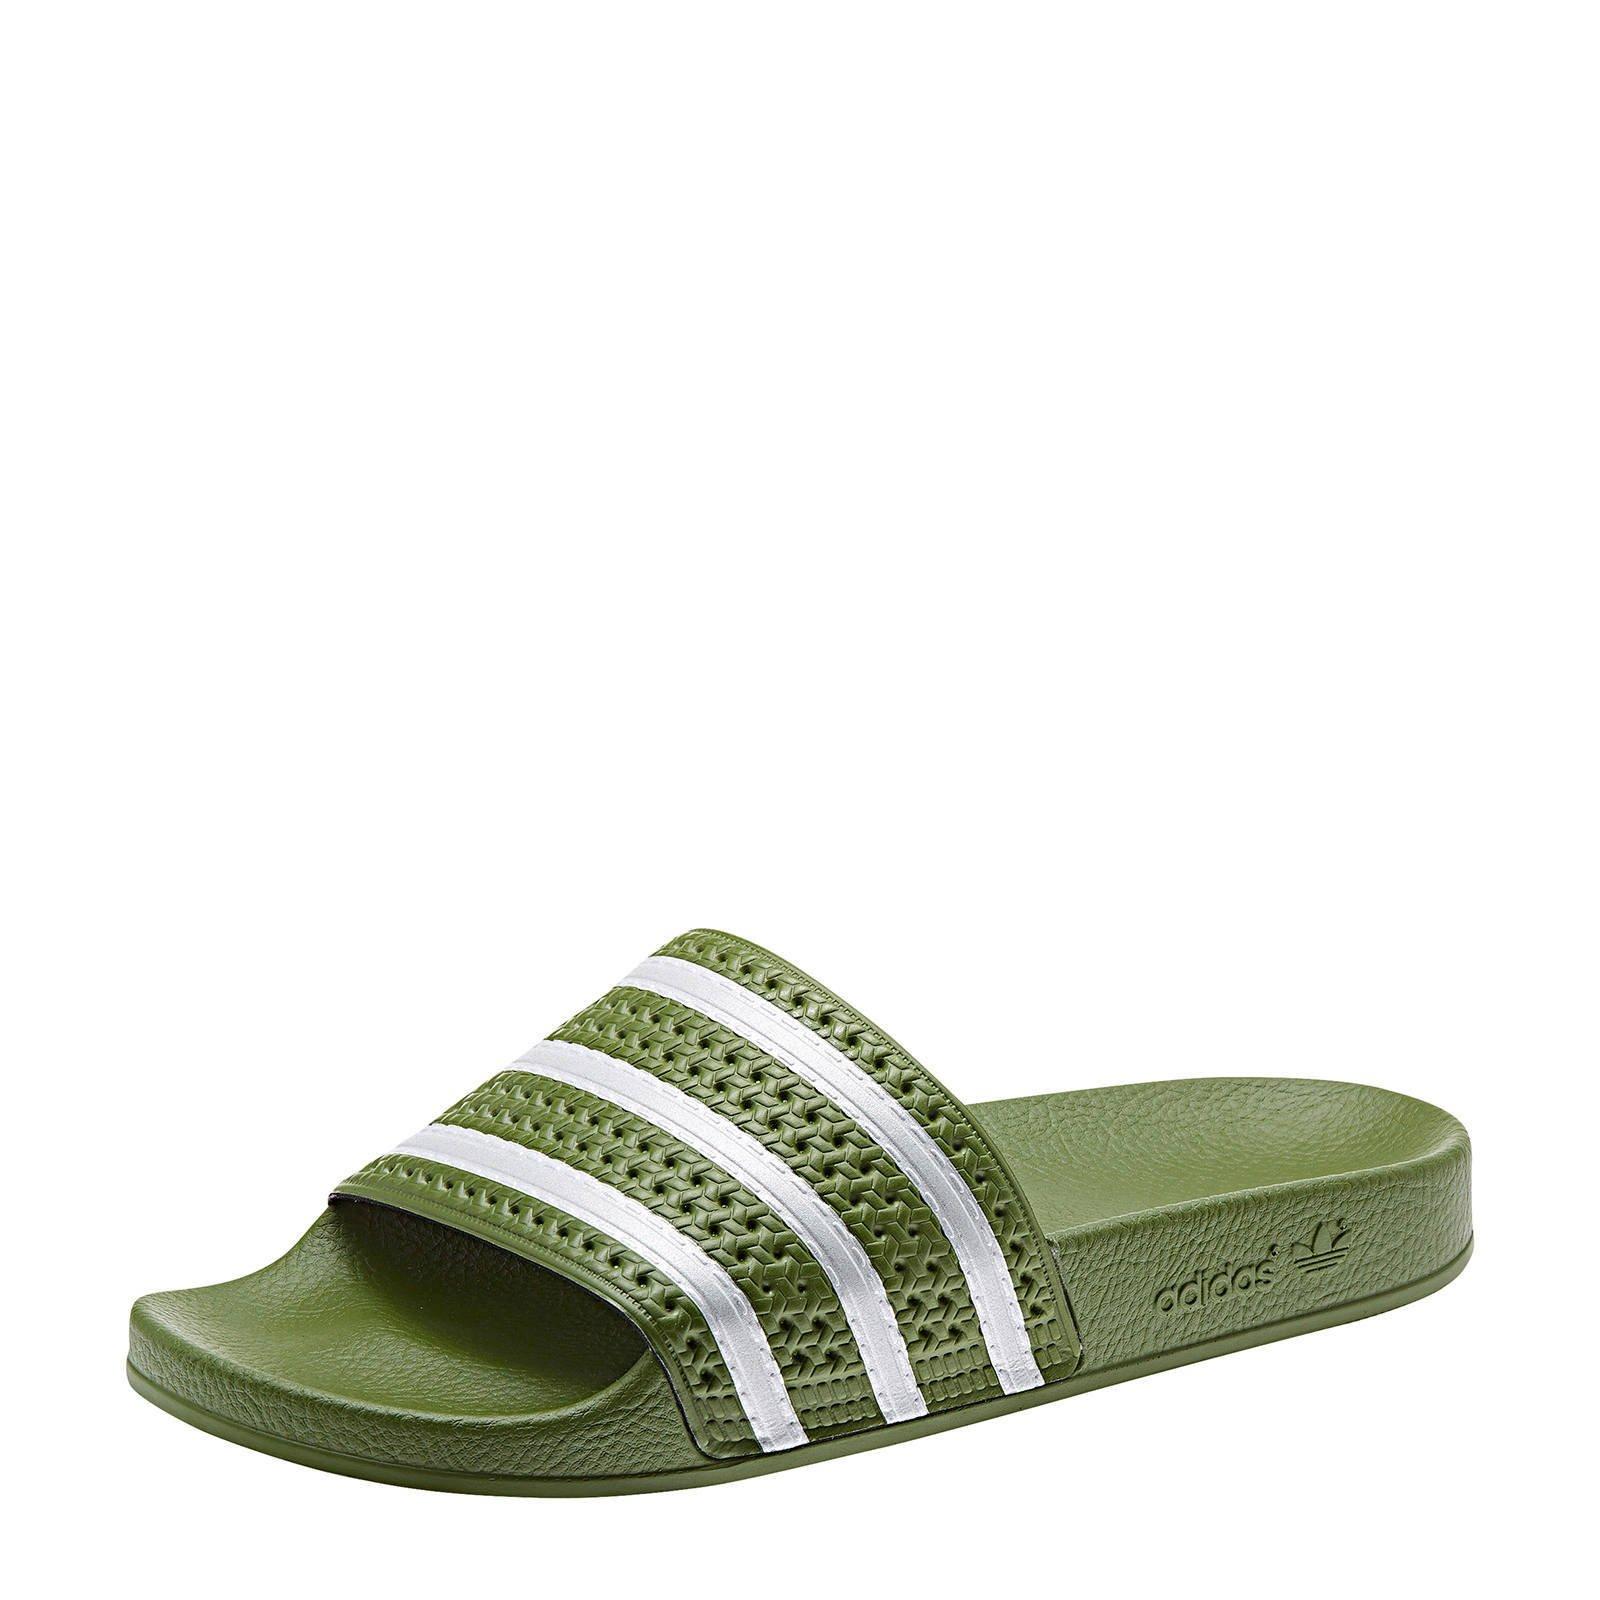 adidas Originals Adilette badslippers olijfgroen | wehkamp